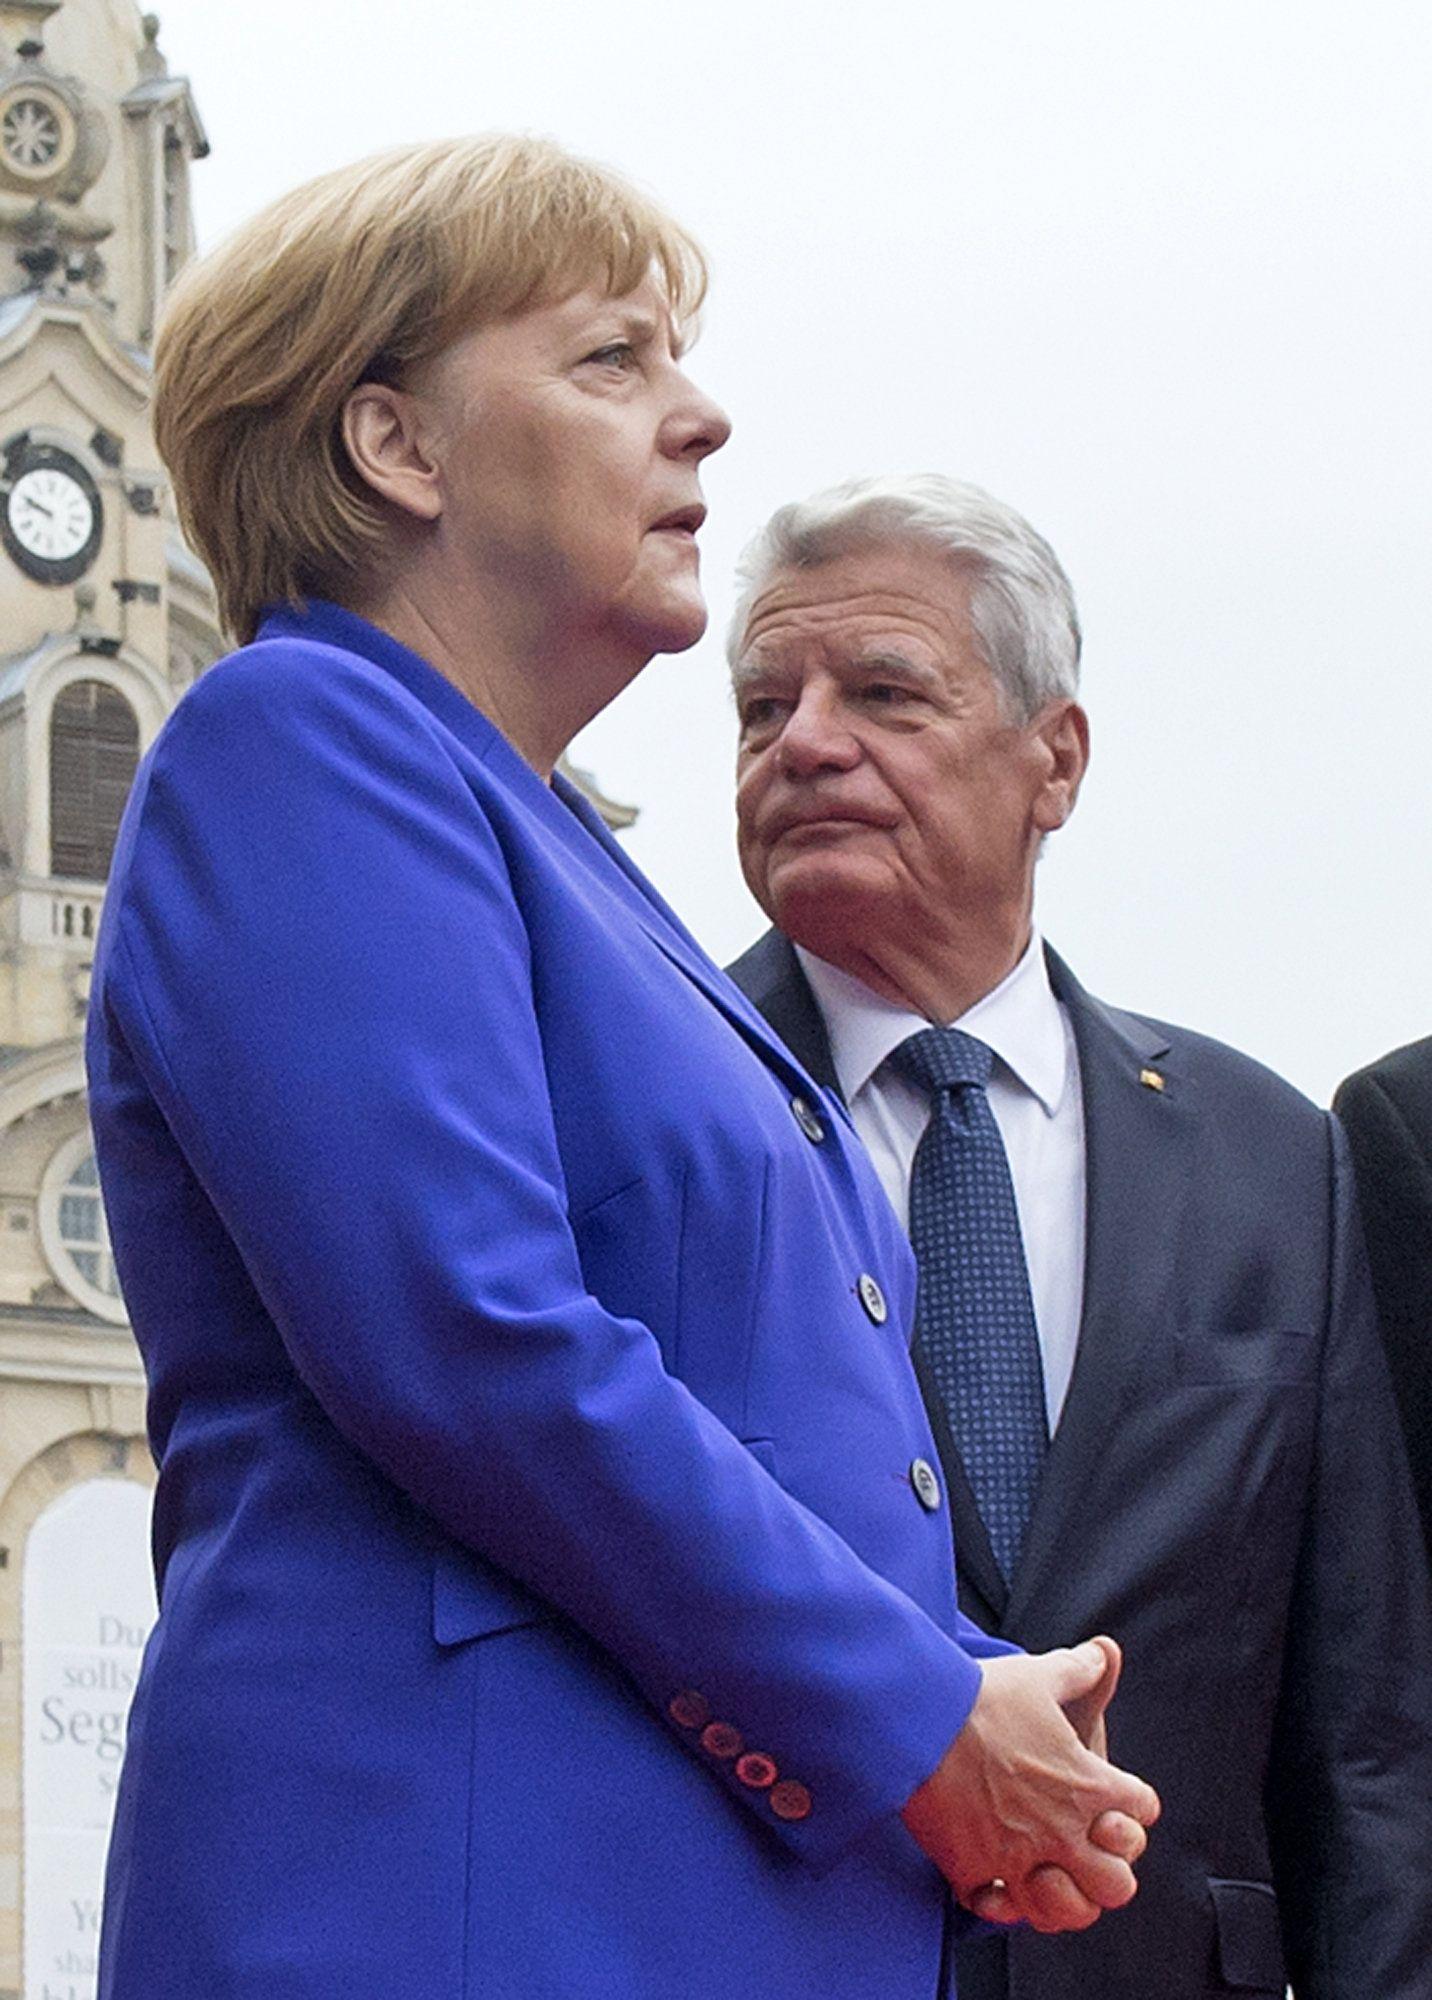 Merkel & Gauck